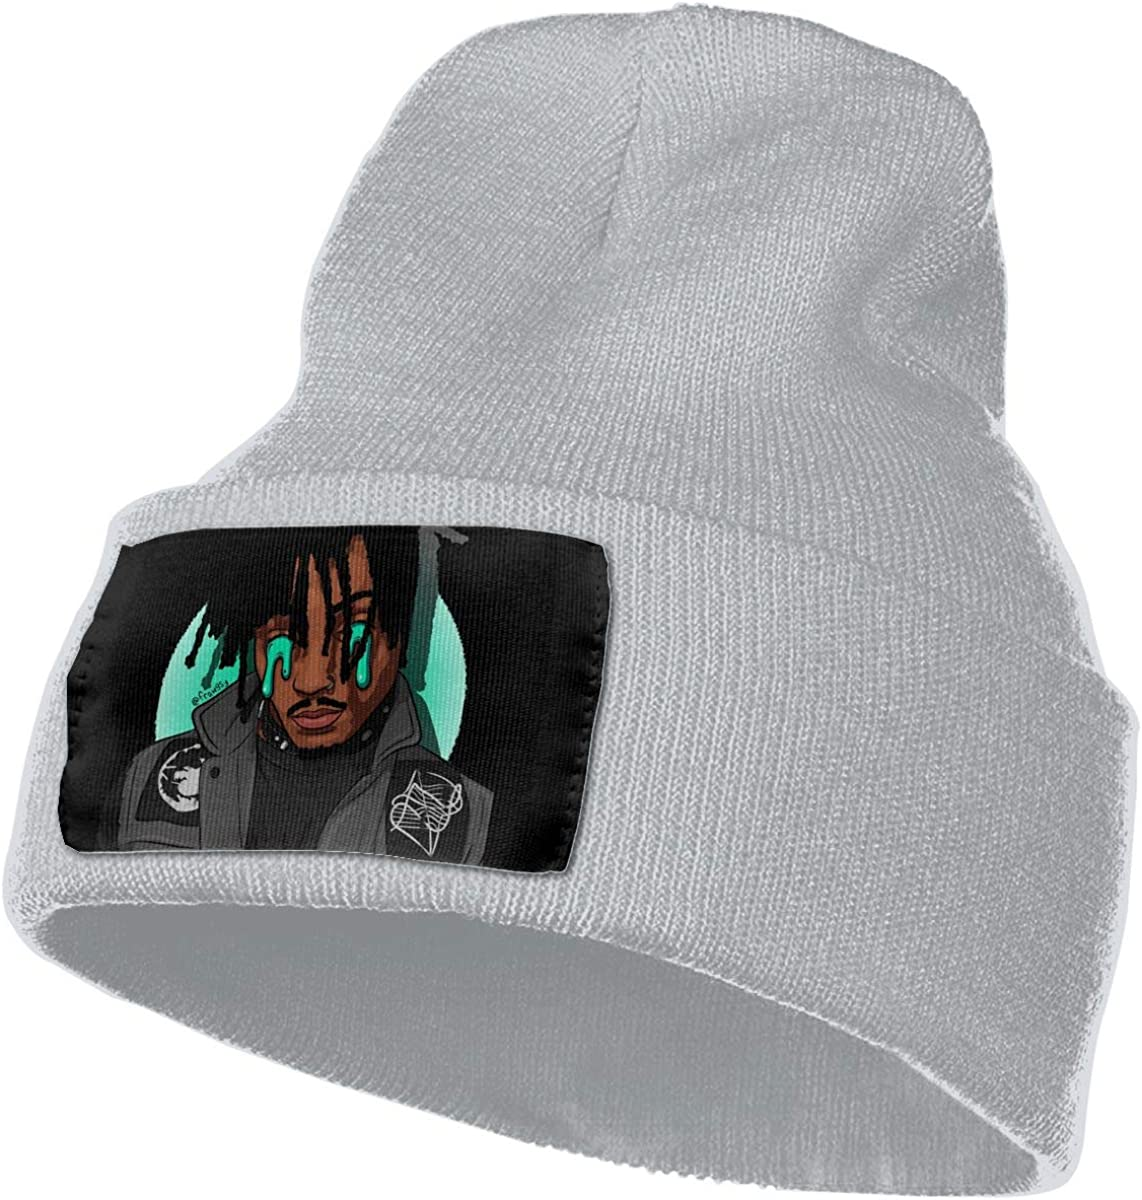 Cewrightdric Winter Juice Wrld Warm Soft Knit Cap Beanie Hats for Mens Womens Black